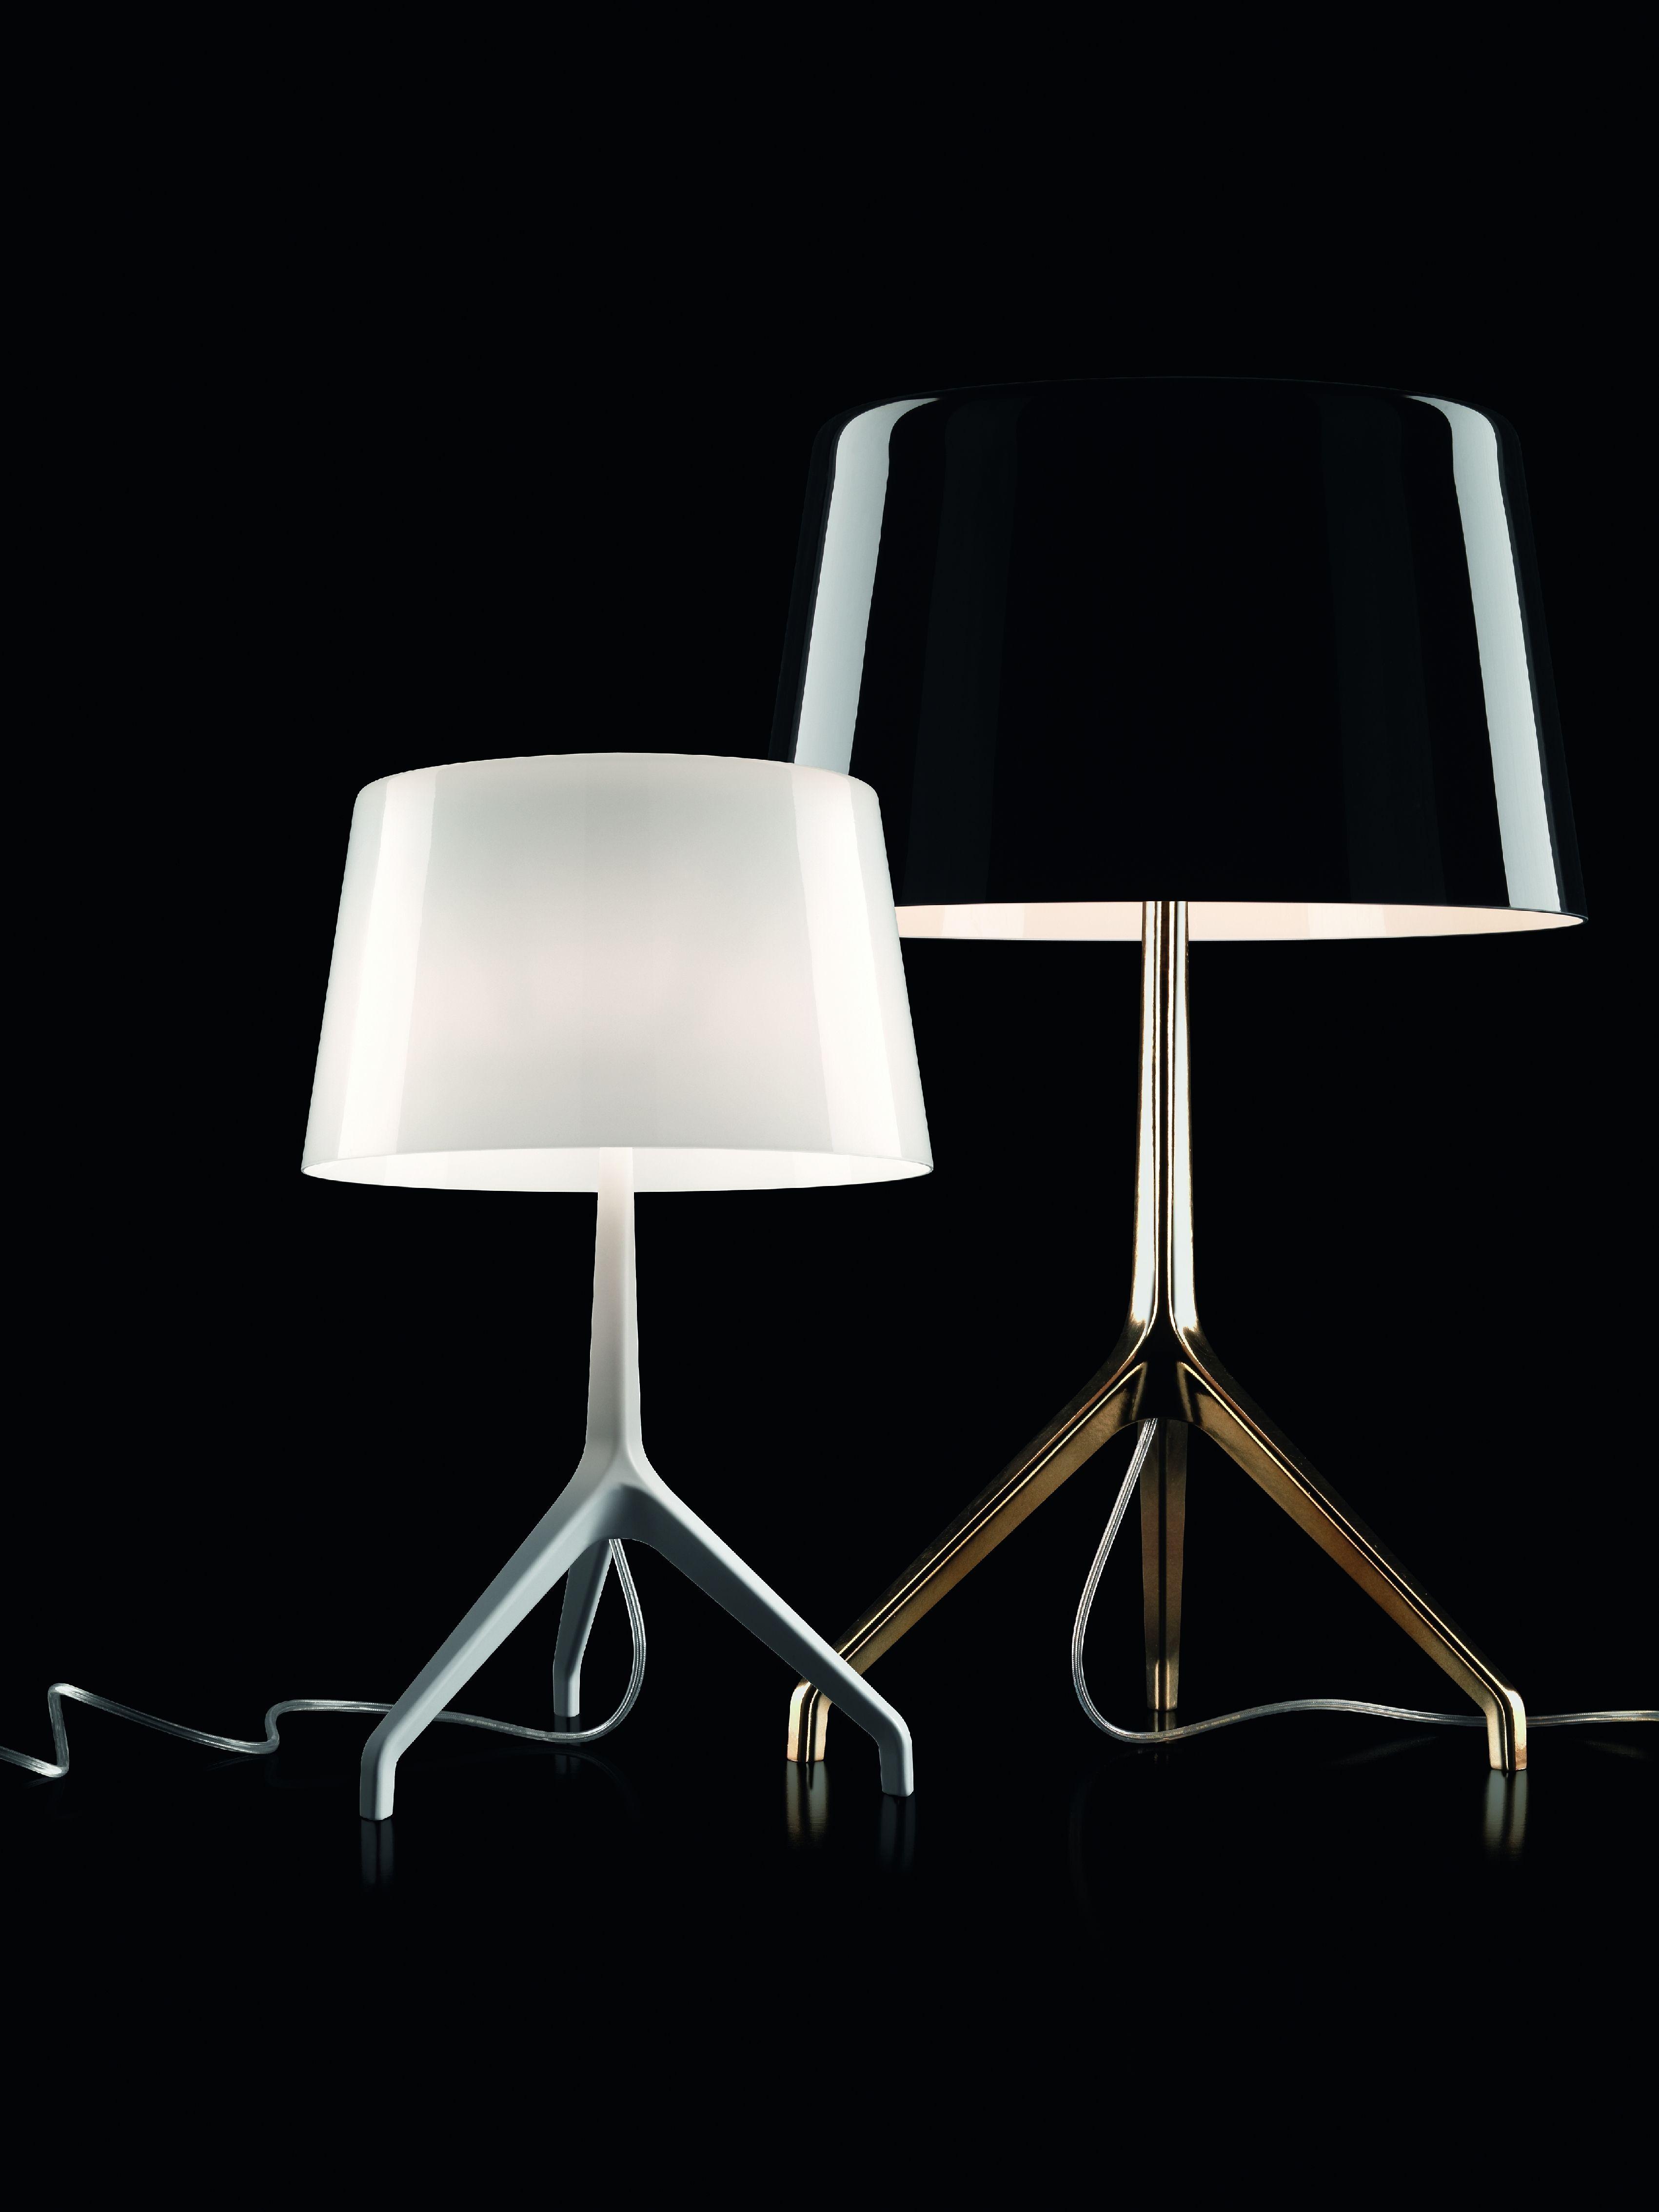 lampe de table lumi re xxs foscarini noir pied bronze h 40 x 26 made in design. Black Bedroom Furniture Sets. Home Design Ideas